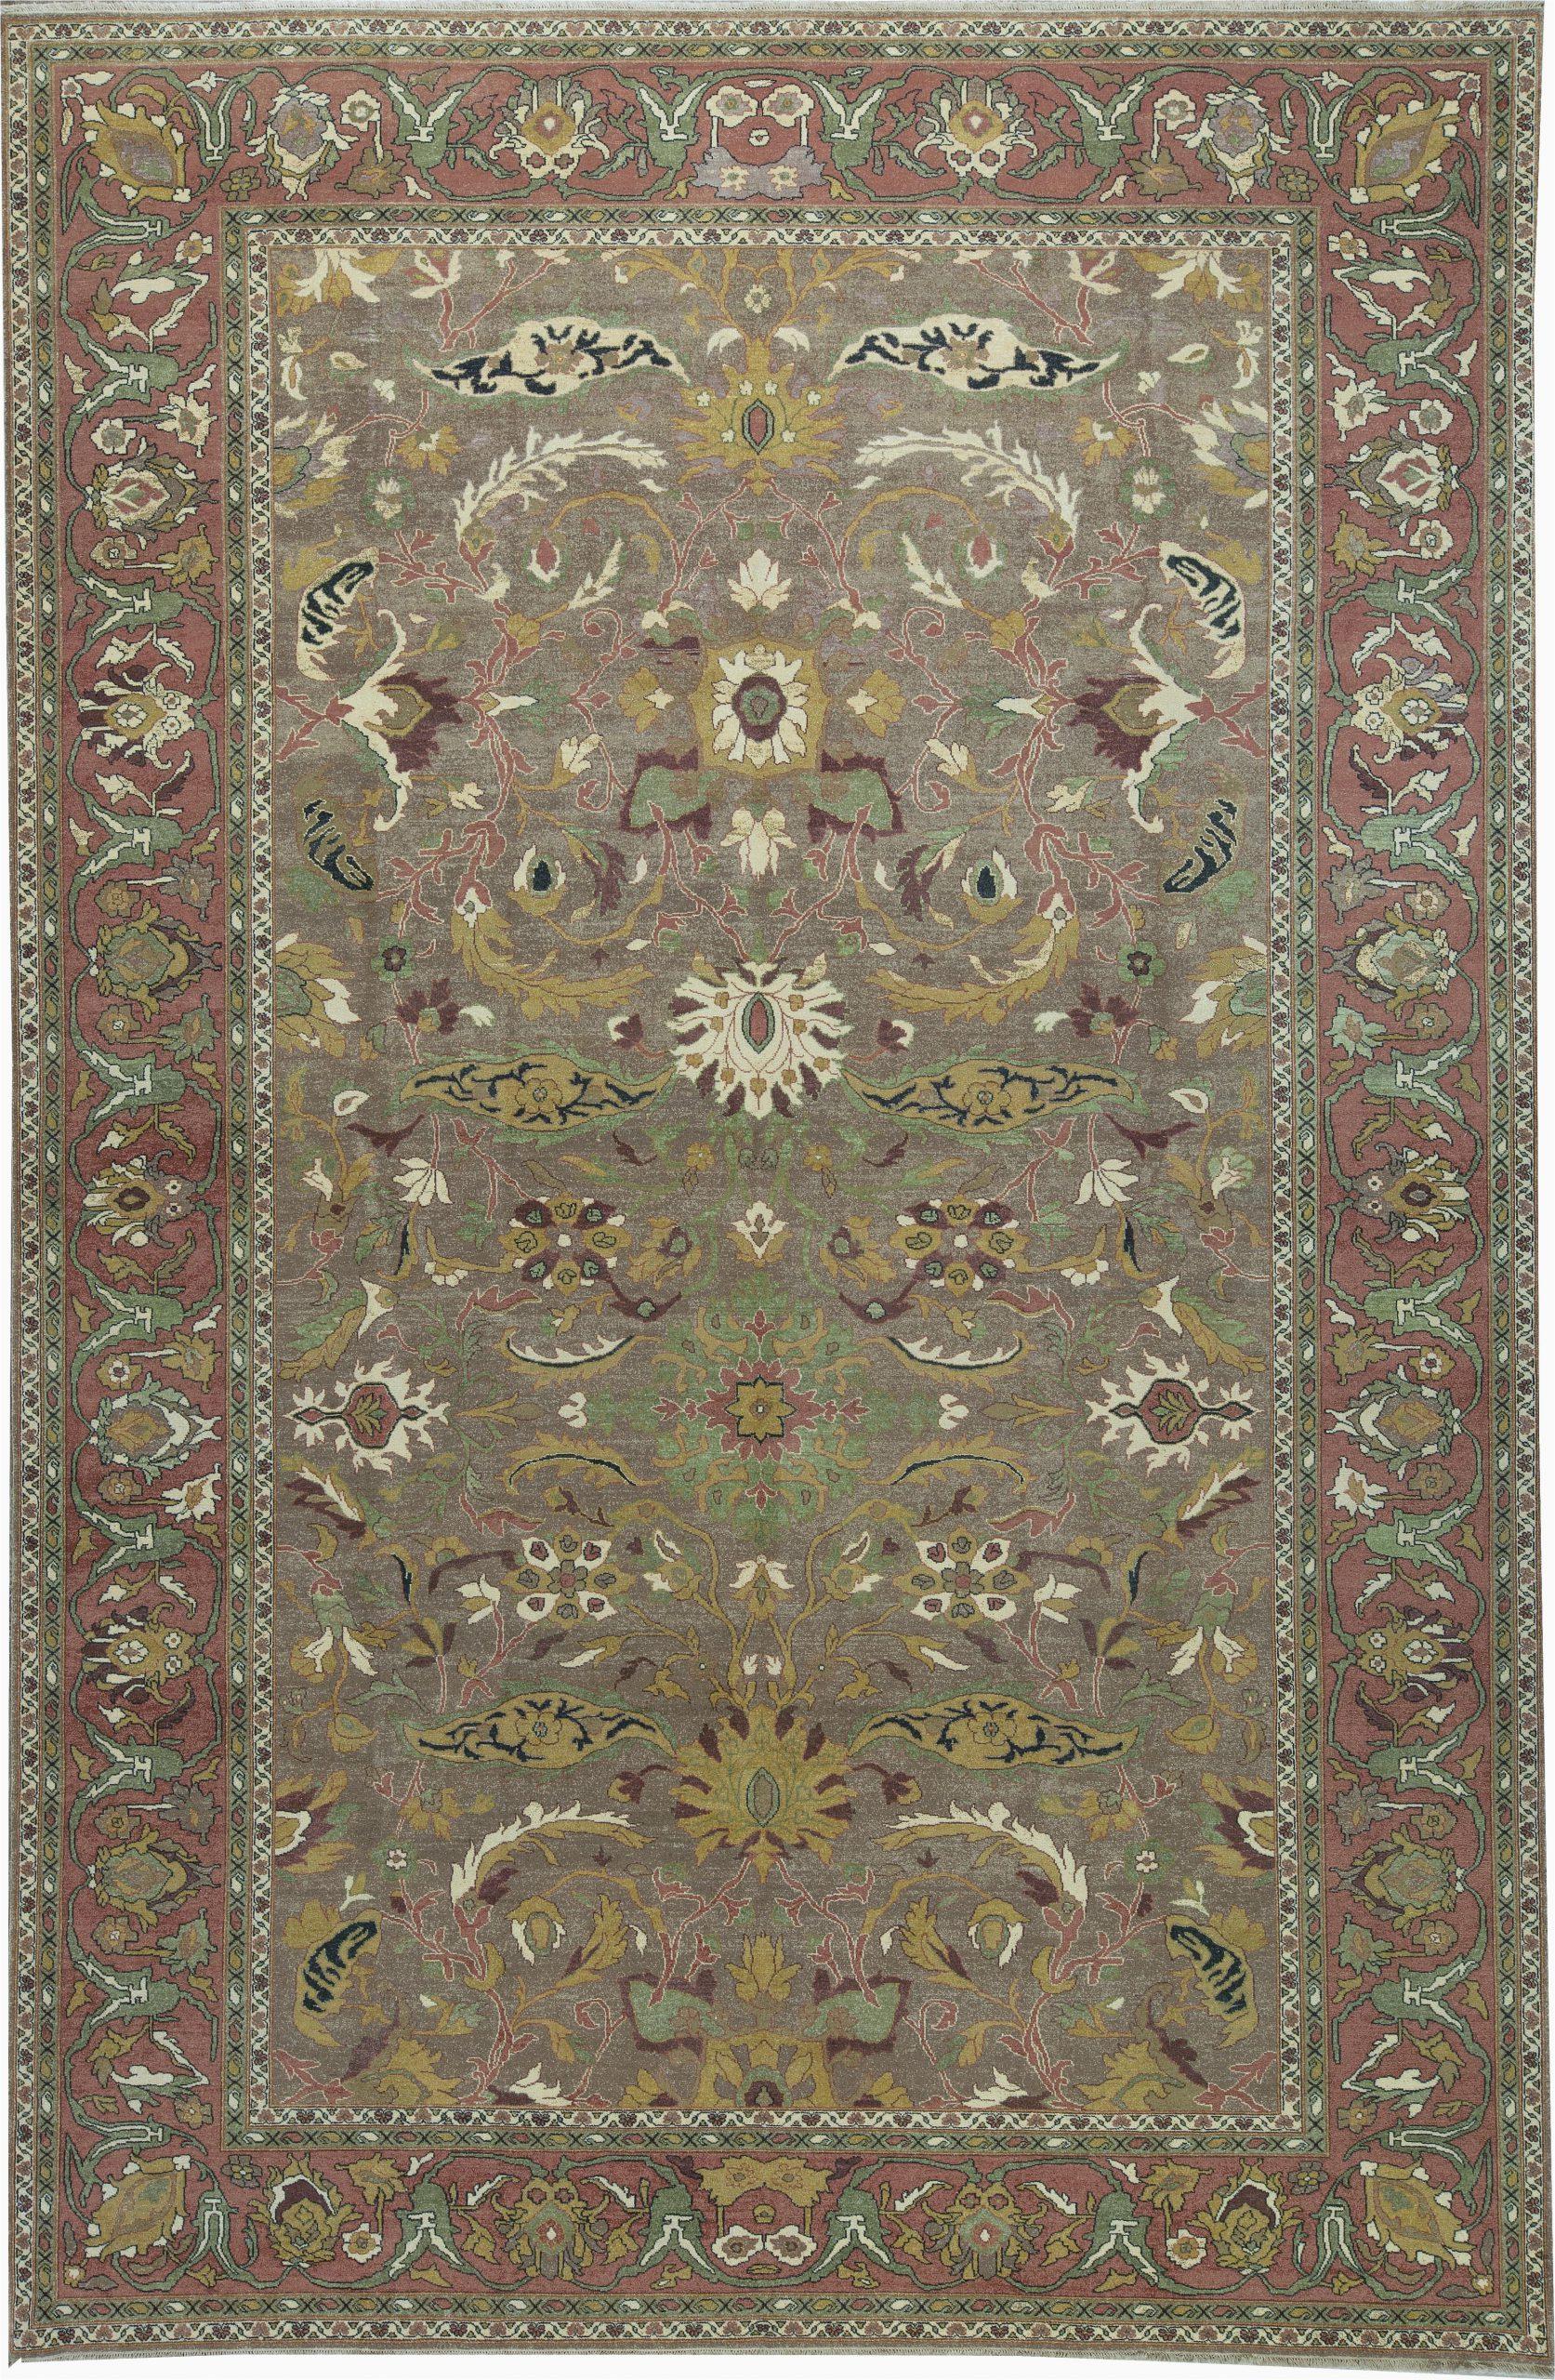 bokara rug co inc one of a kind cornwall handwoven 1111 x 179 wool brown area rug abhd2677